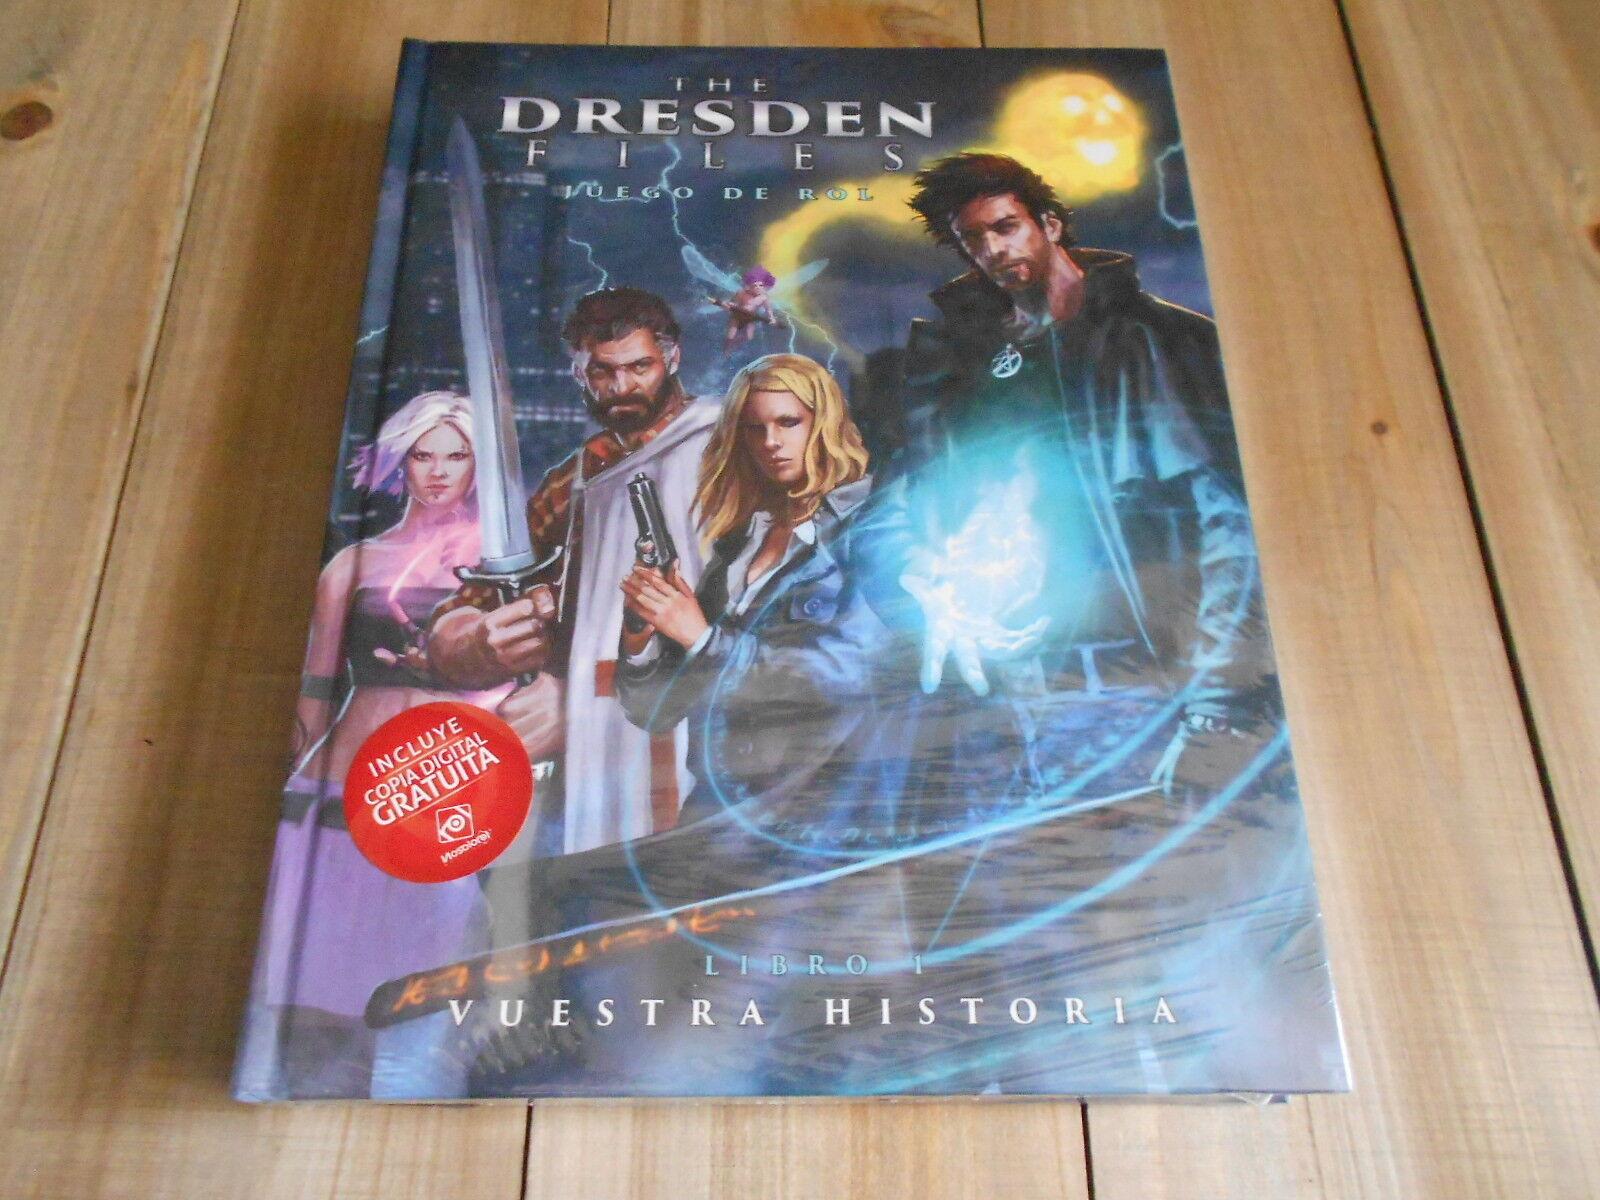 The Dresden Files - Basic - Set Role Play - Nosolgoldl Jim Butcher - Edition